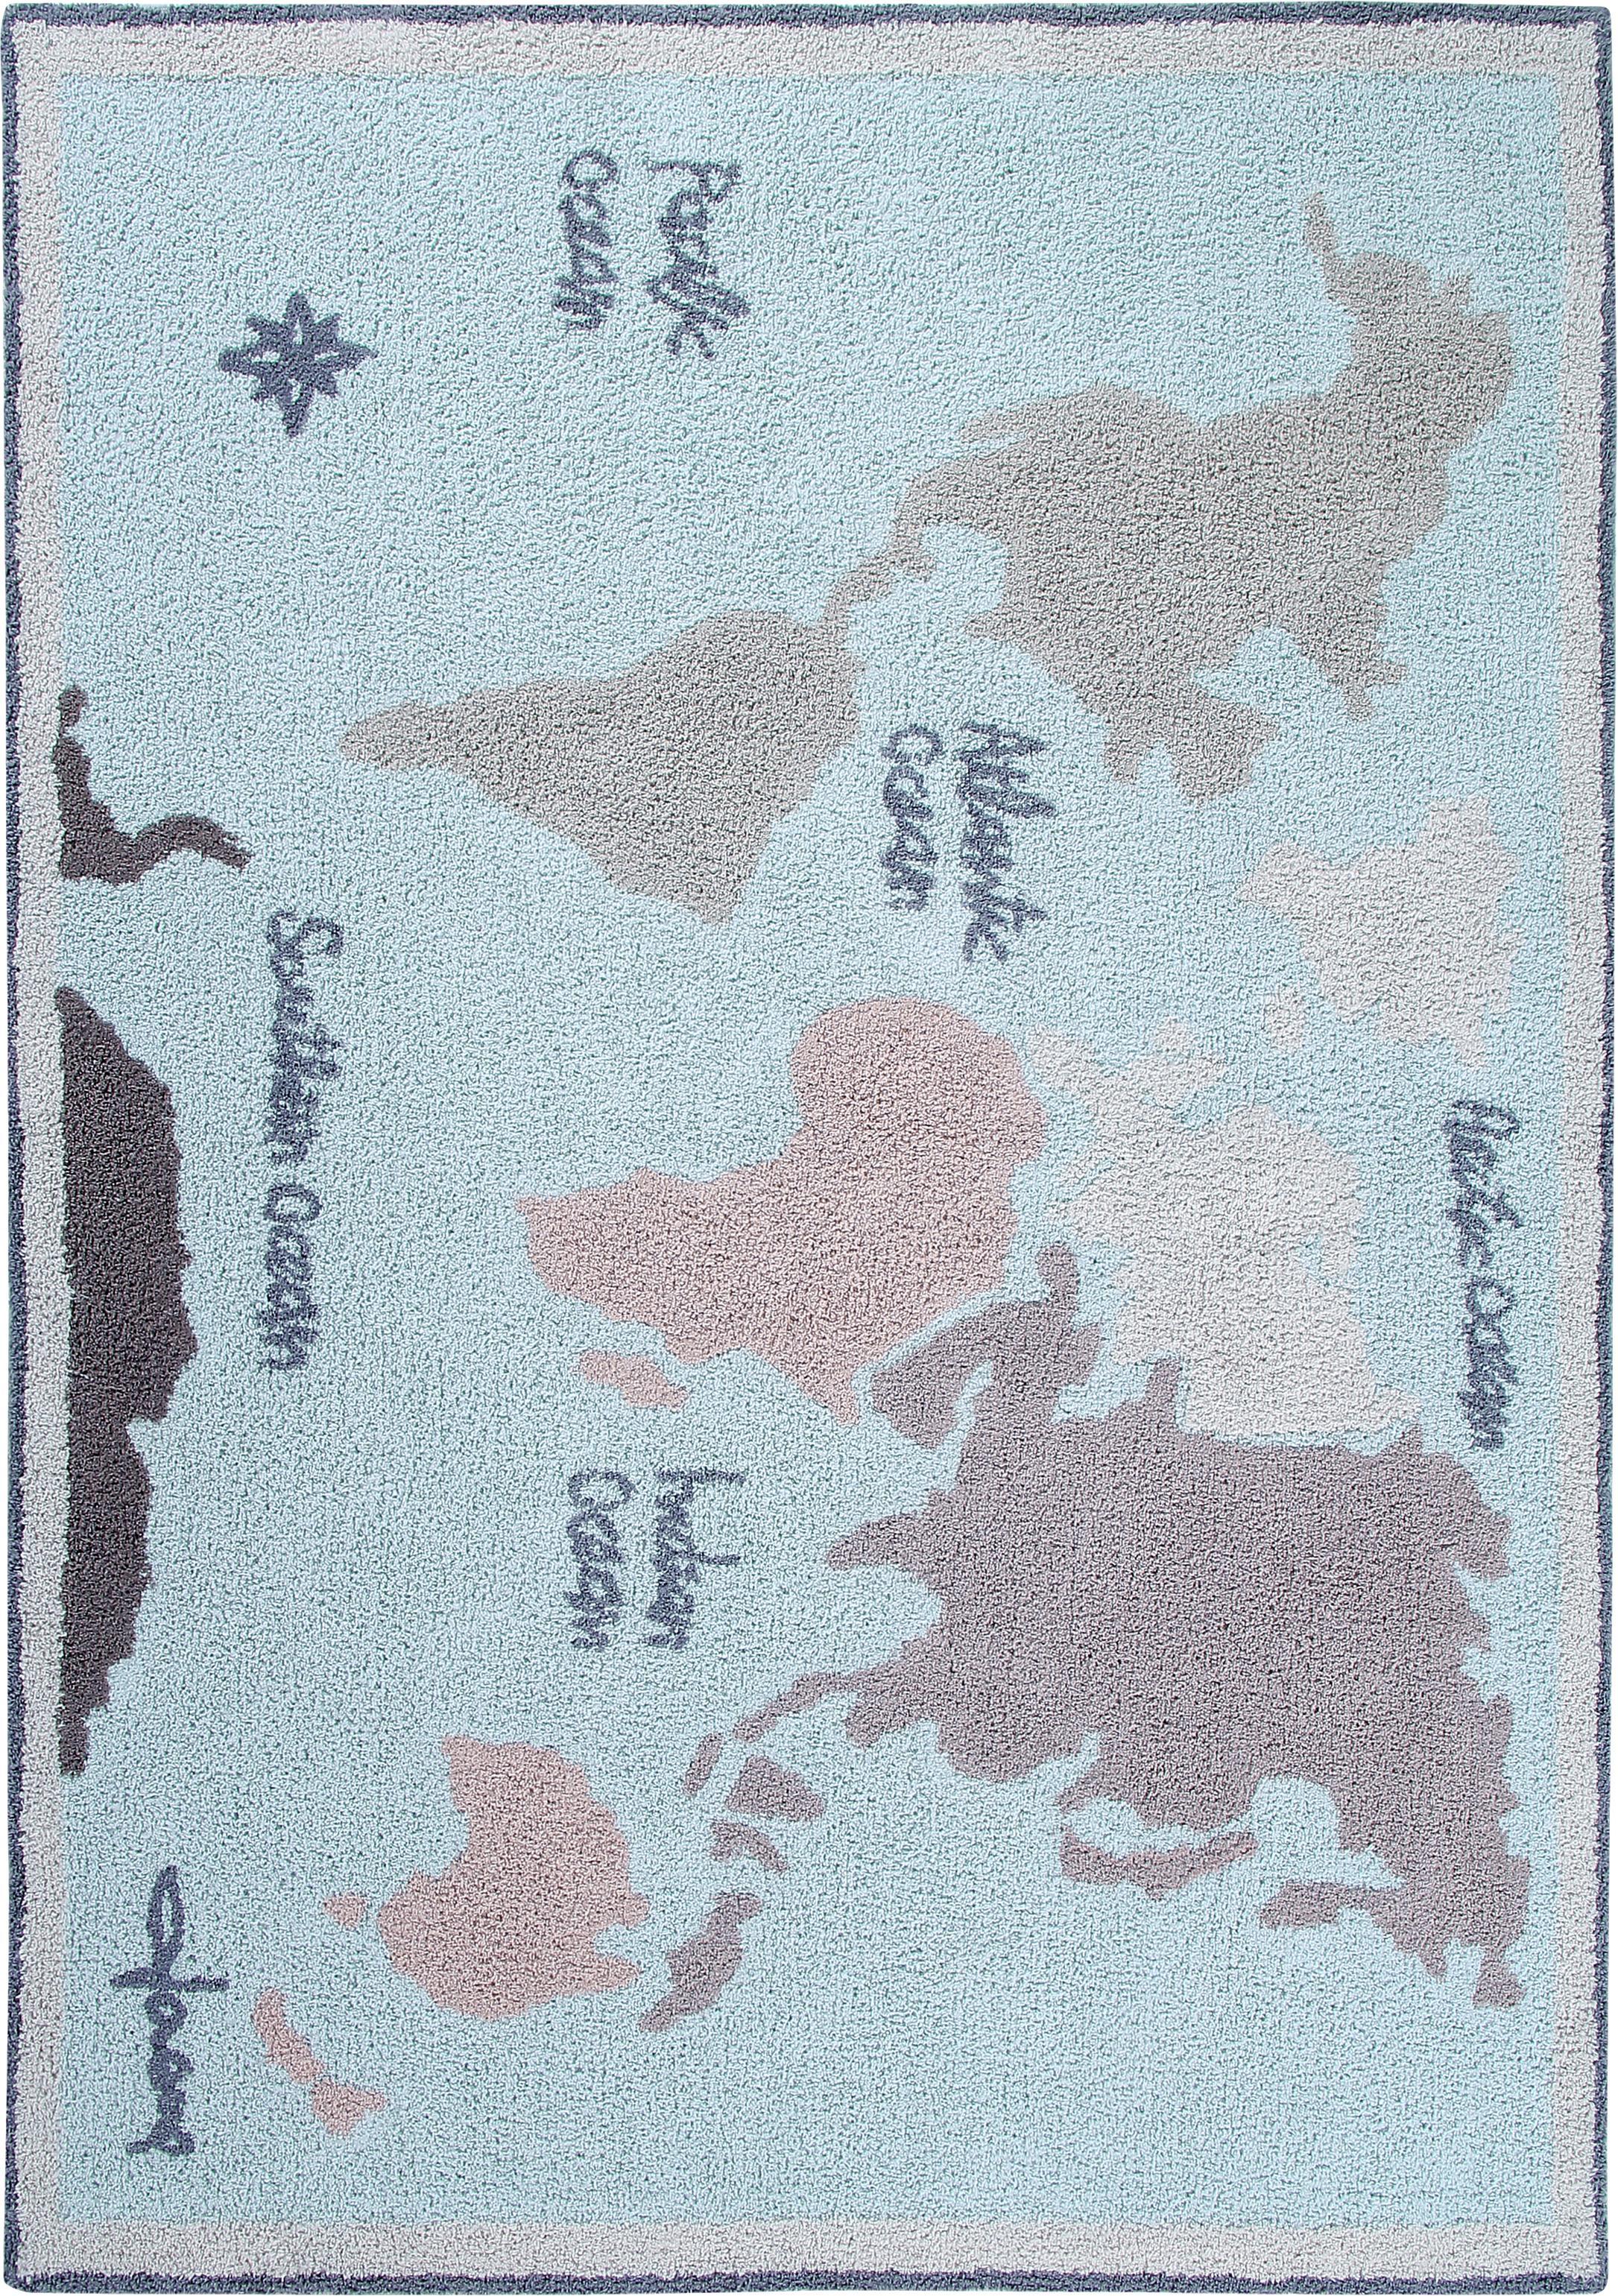 Waschbarer Teppich Vintage Map, Flor: 97% Baumwolle, 3% recycel, Beige, Grau, Blau, 140 x 200 cm